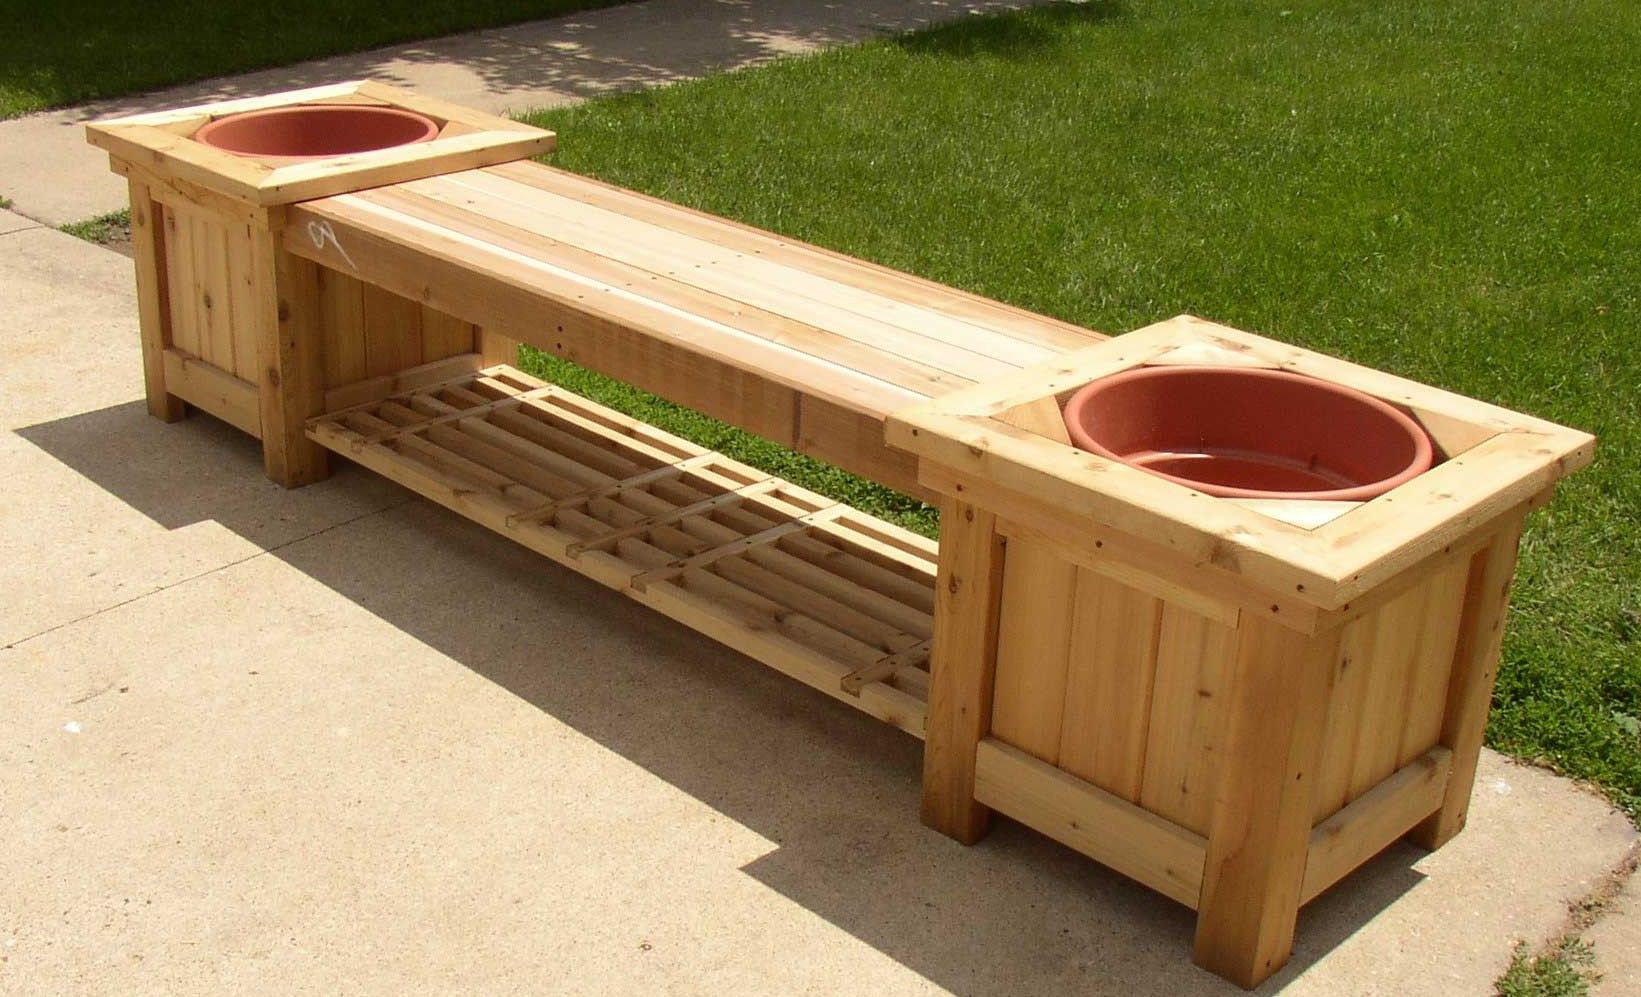 Diy Wood Planter Bench Plans Wooden Pdf Build Woodworking